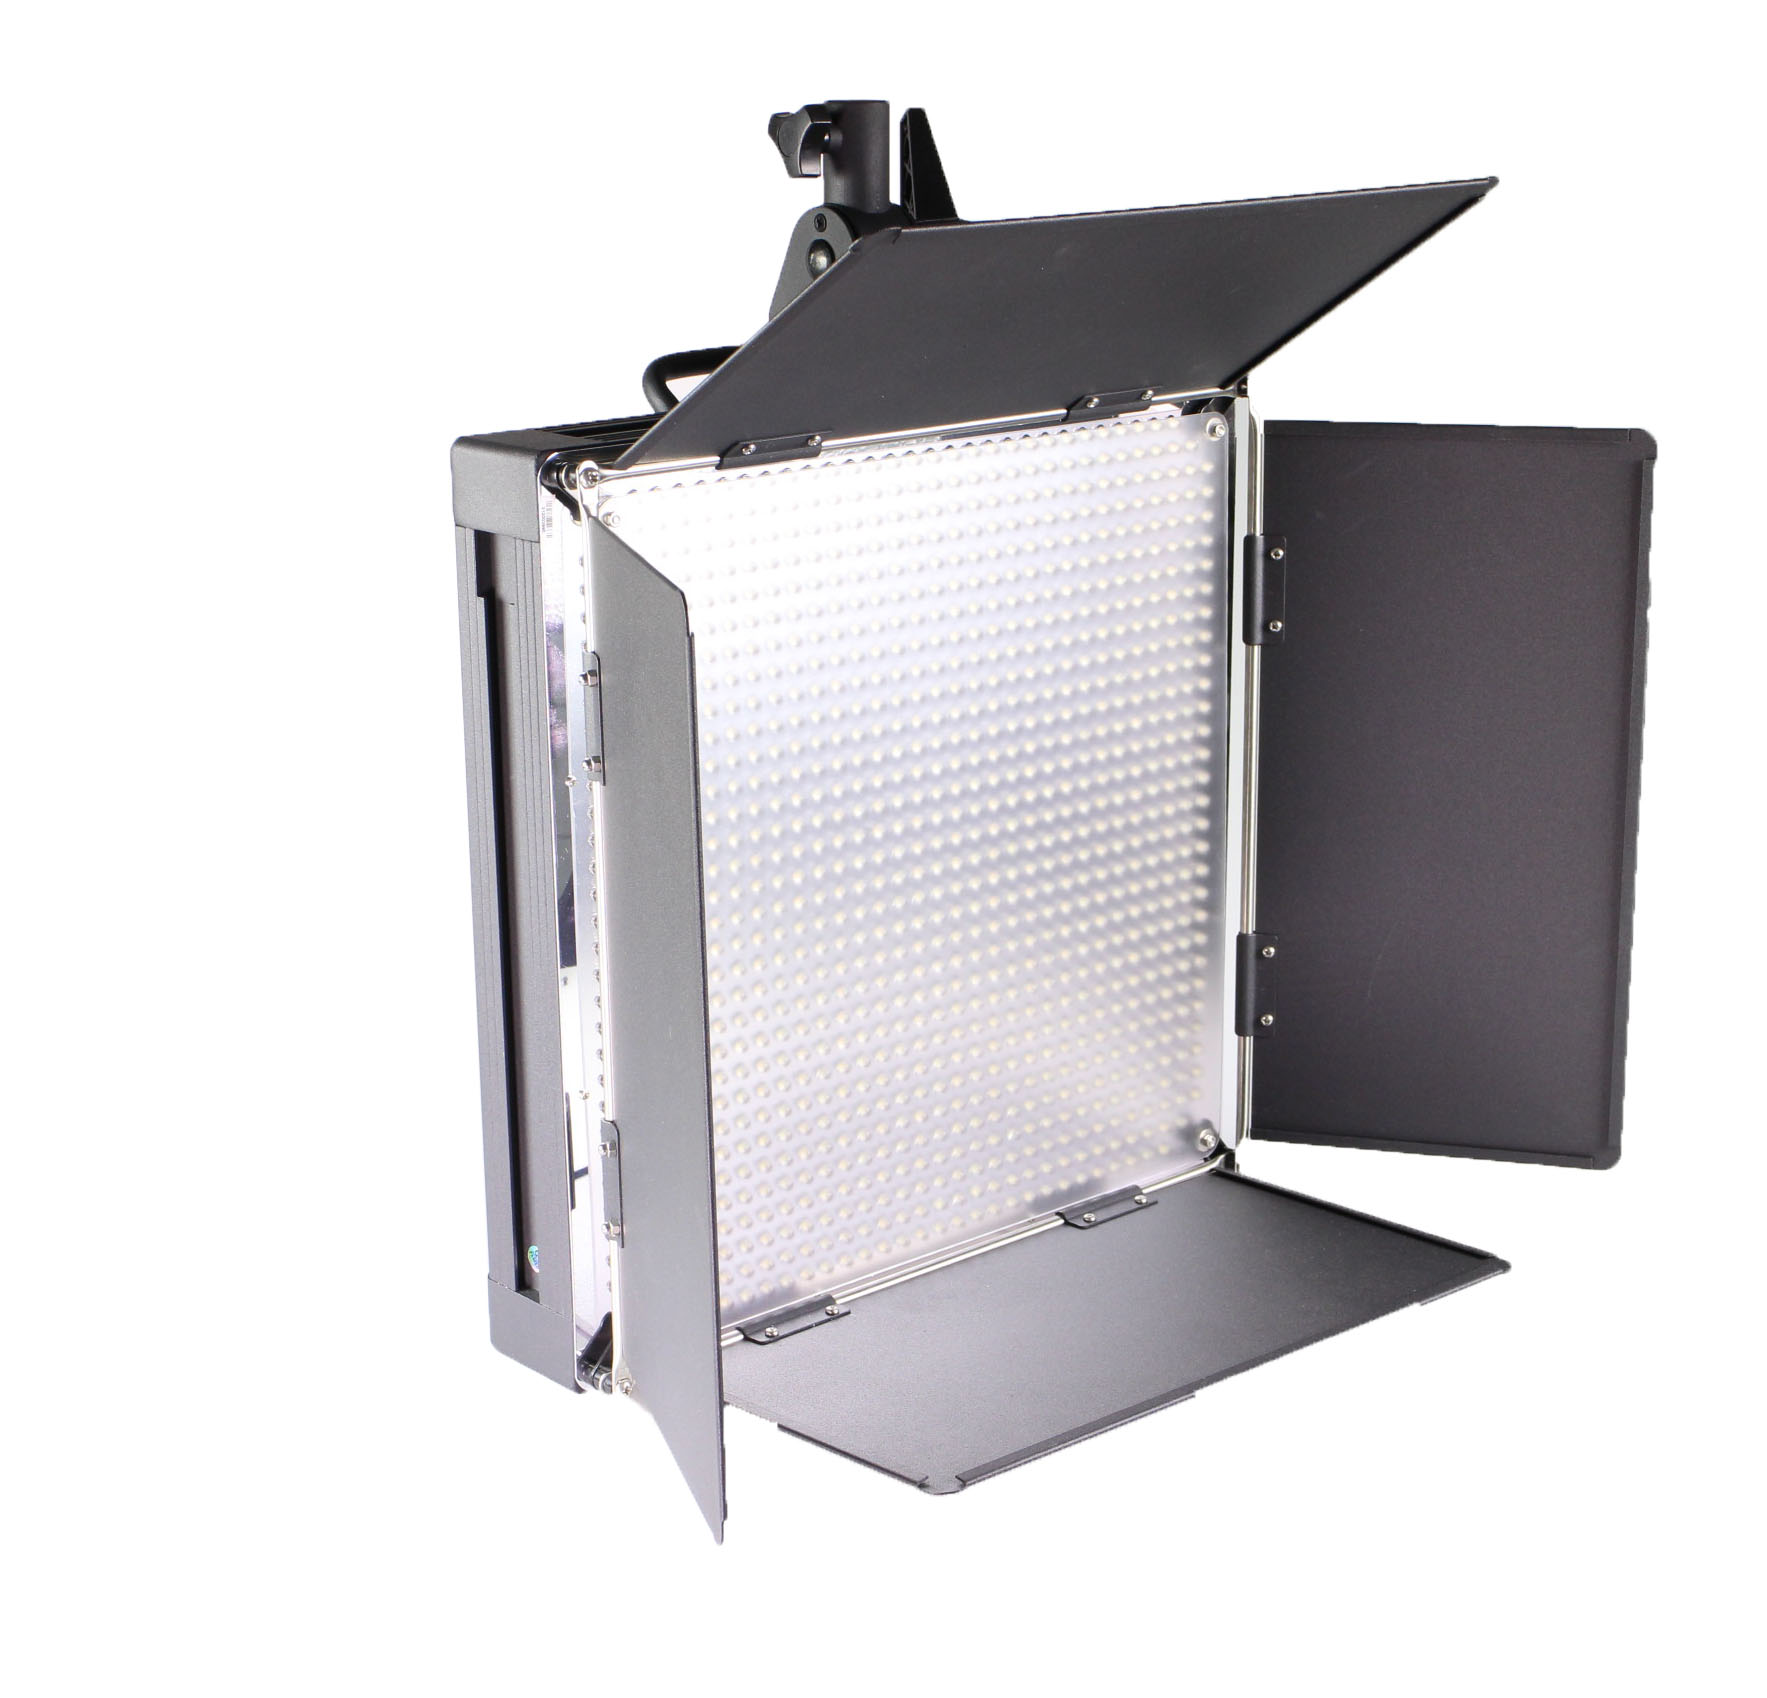 Artikelfoto Dimmbare BiColor Studioleuchte LED 1000ASVL 50 Watt